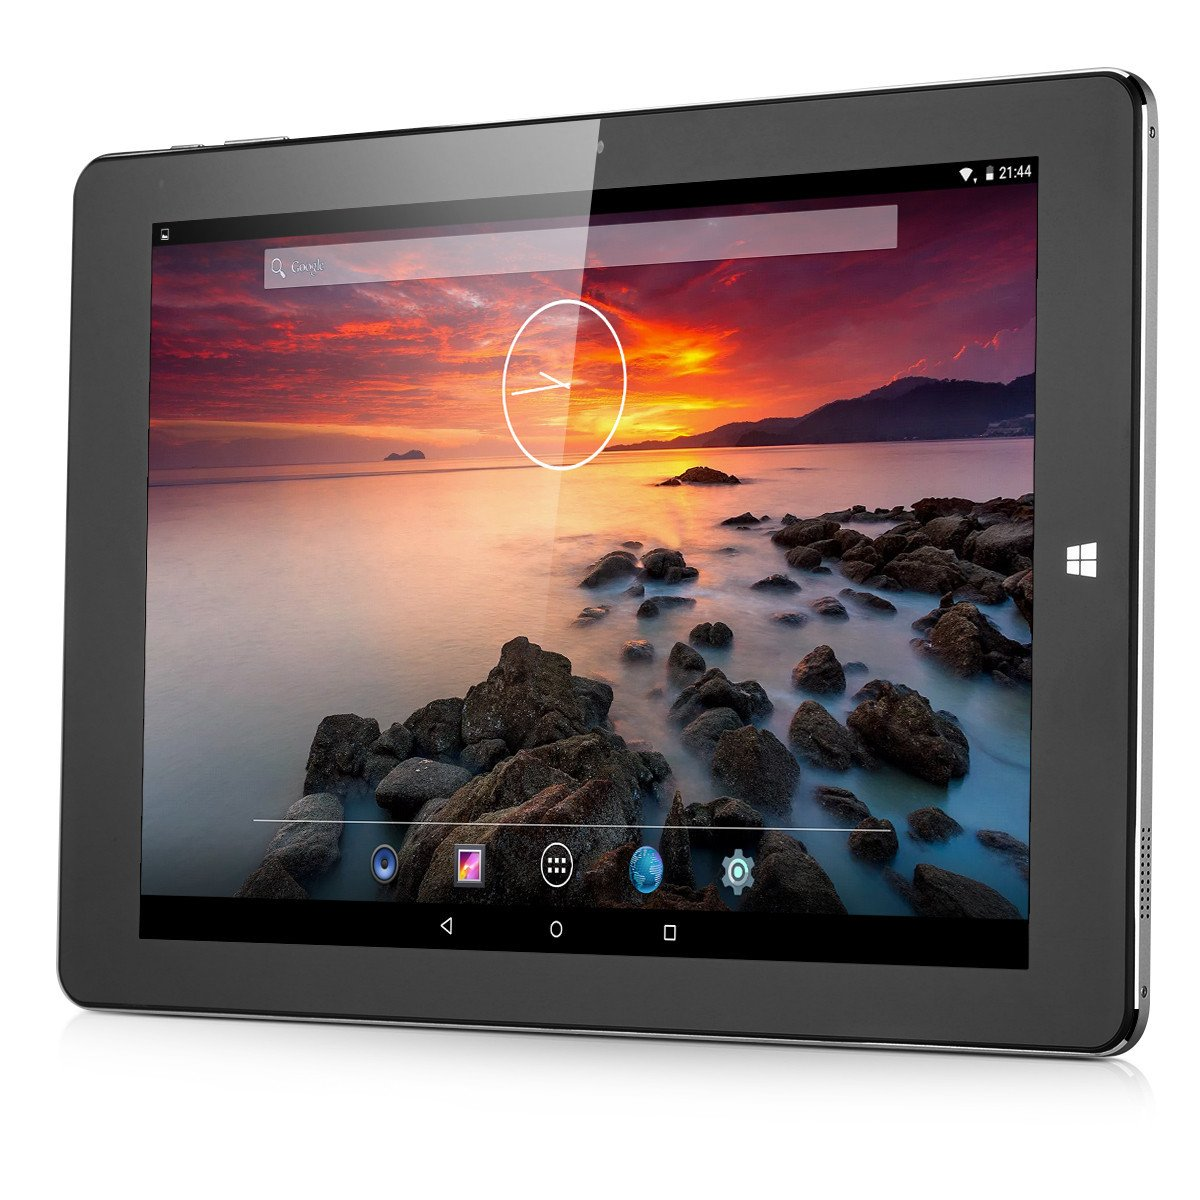 "New Arrival 10.8"", CHUWI Hi10 PLUS, Tablet PC, HD 1920 1280, Win10 + Android5.1, Intel Z8350, quad-core, 1.44GHz, 4GB / 64GB, WiFi / BT / External 3G / OTG / G_sensor"